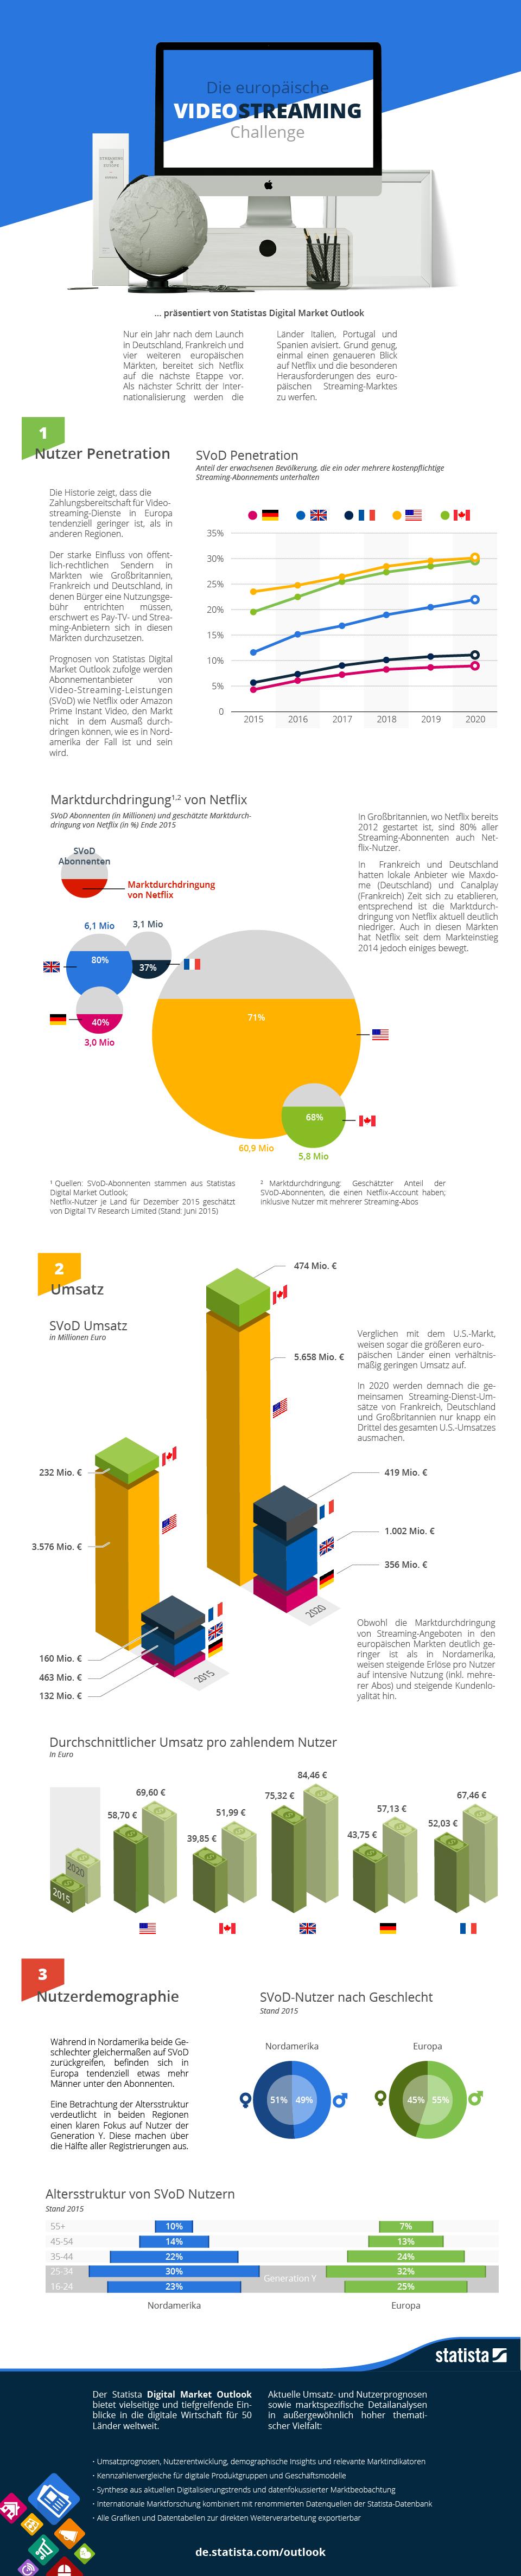 Infografik Streaming Dienste